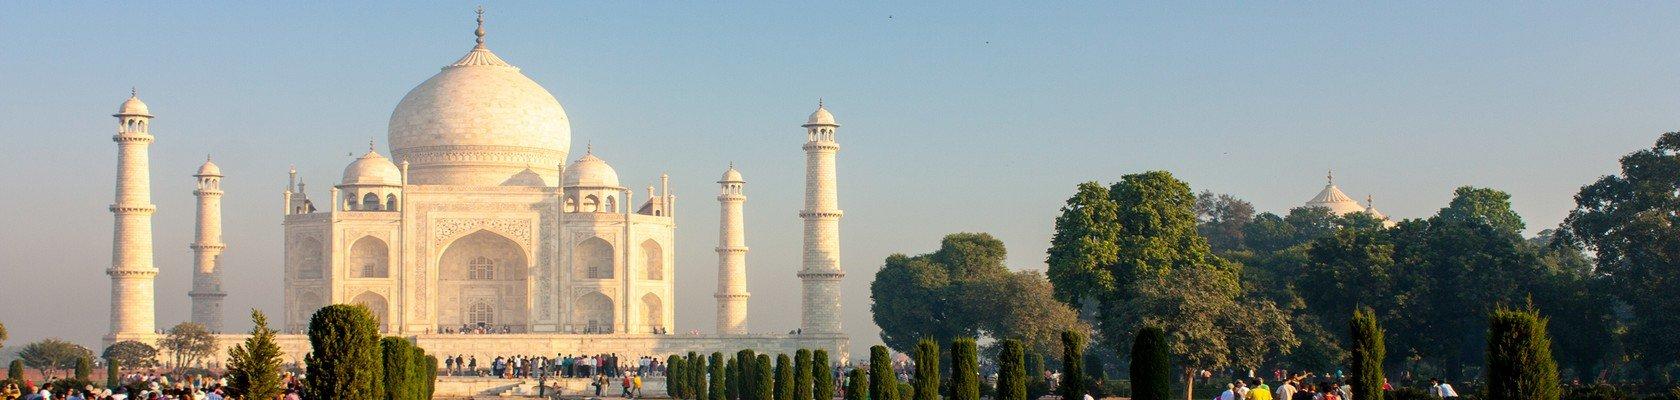 Romantisch Taj Mahal